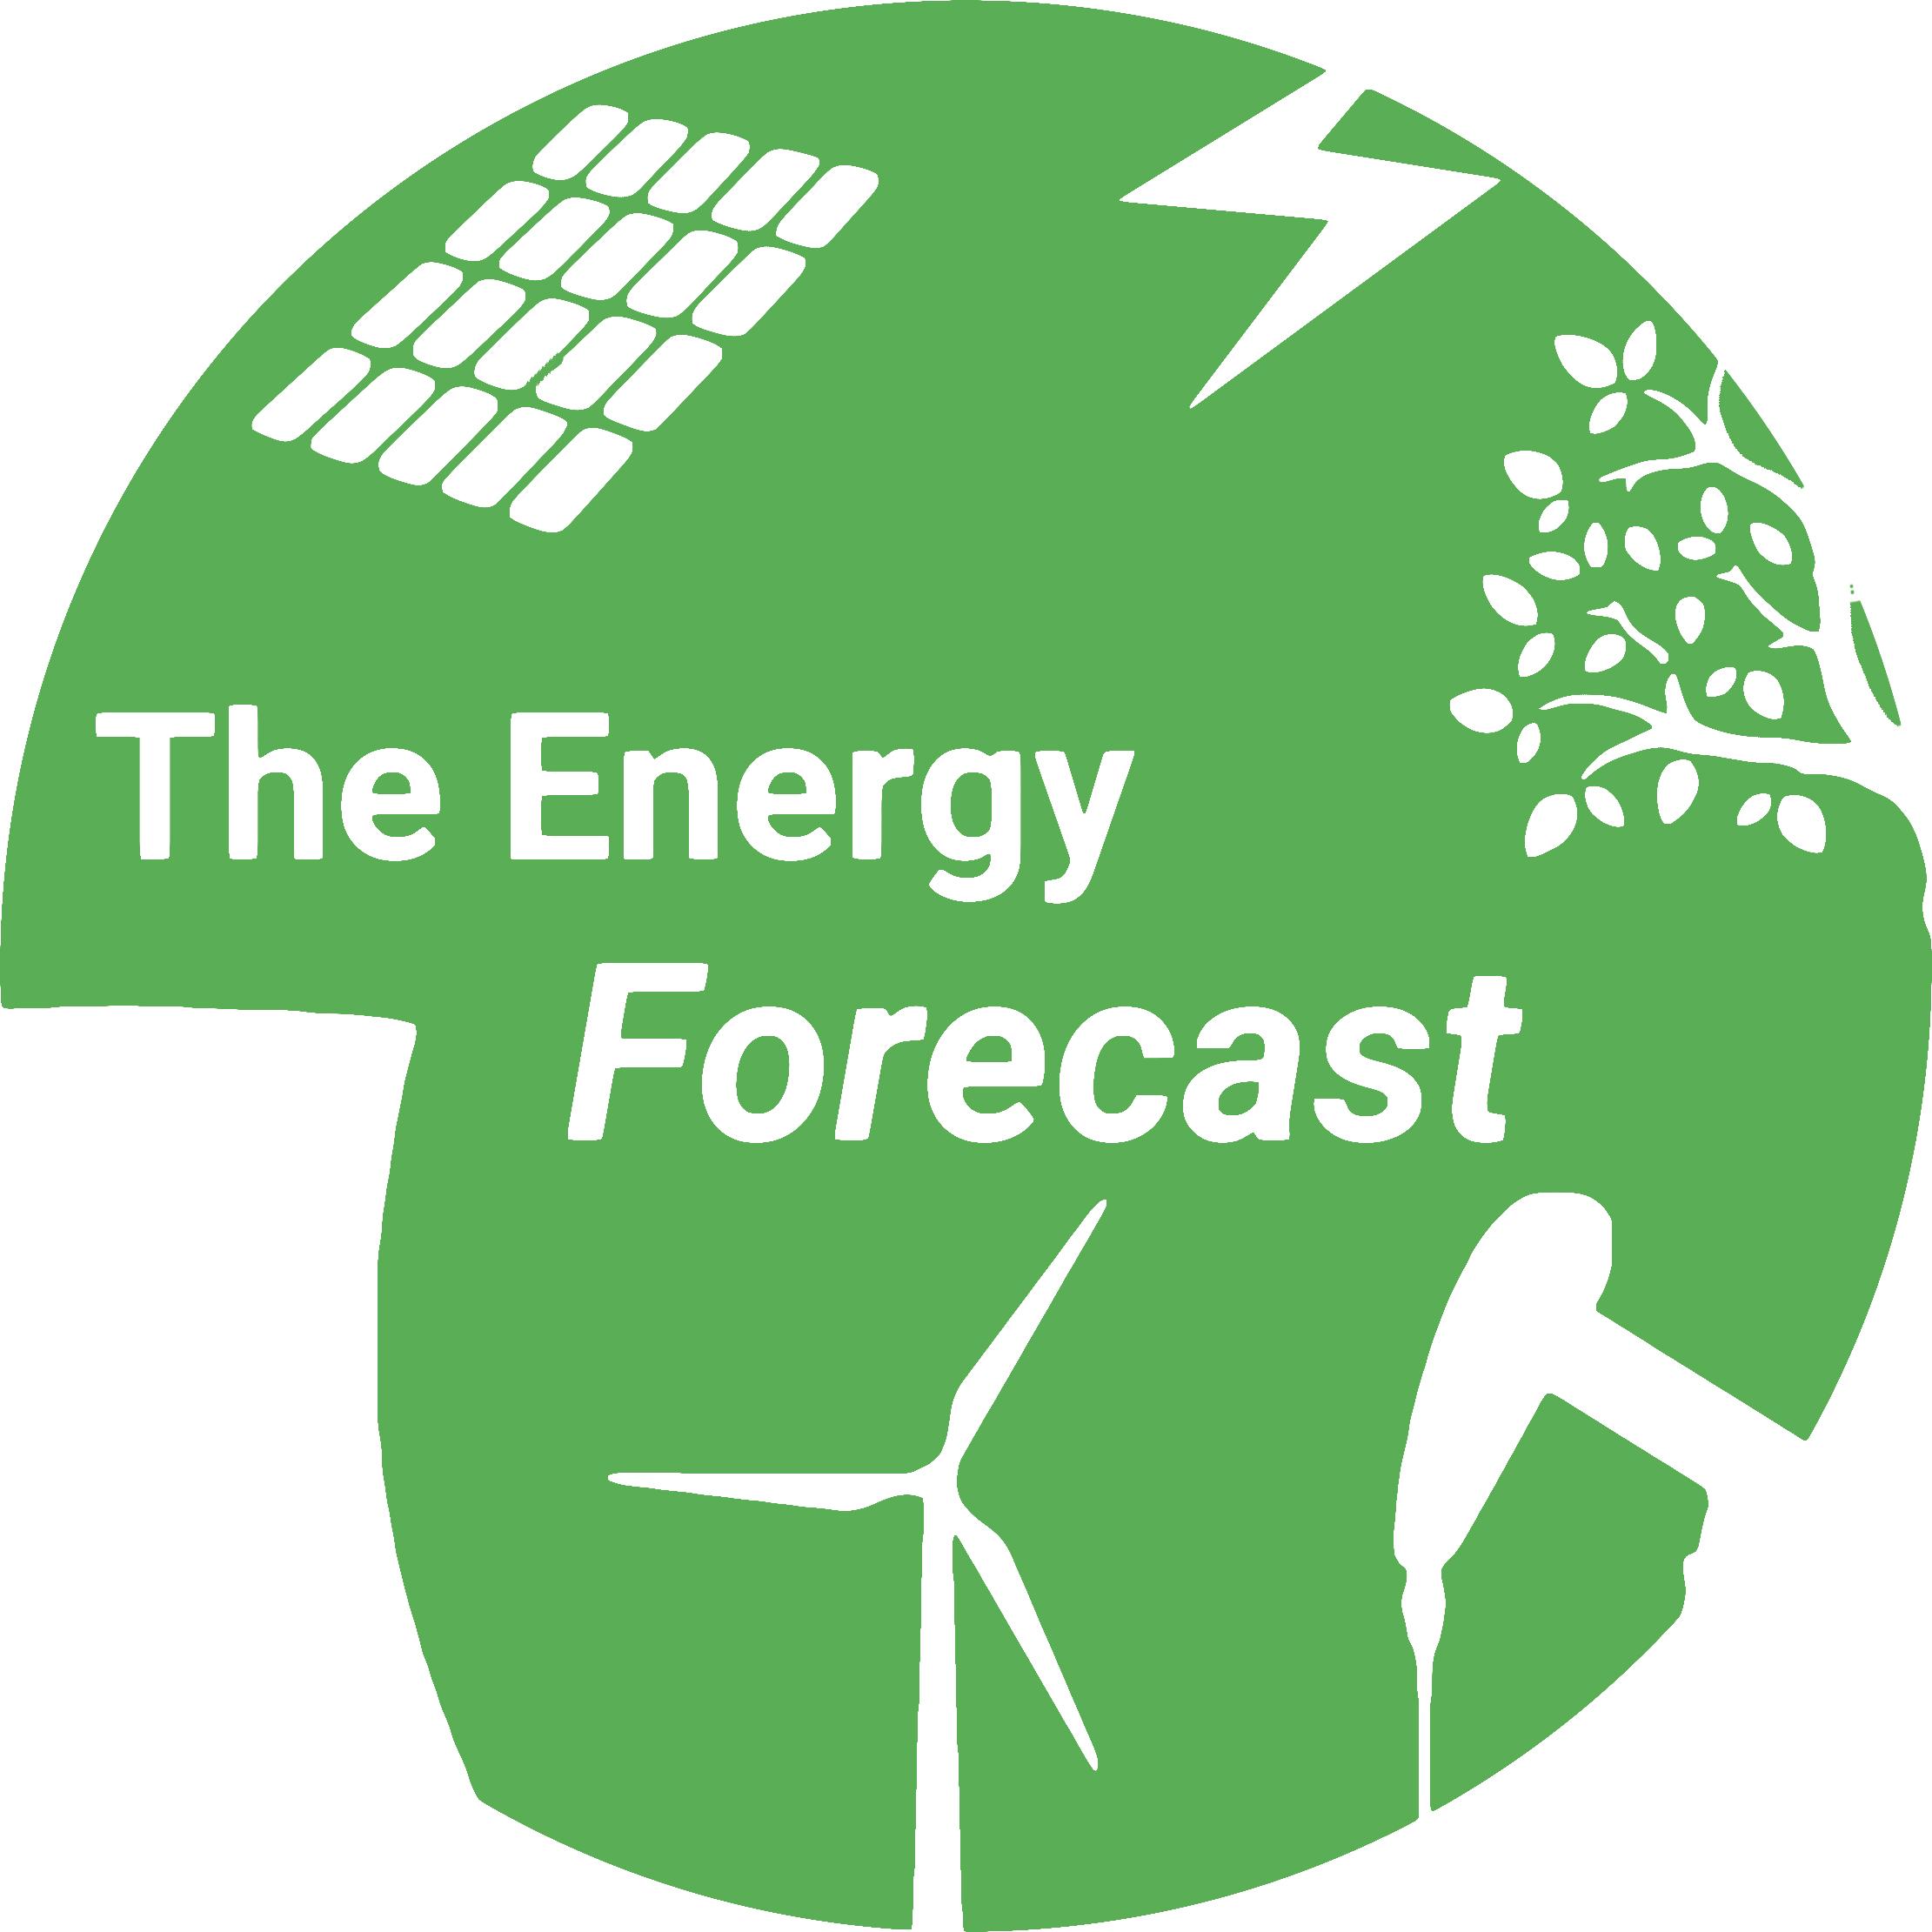 The Energy Forecast